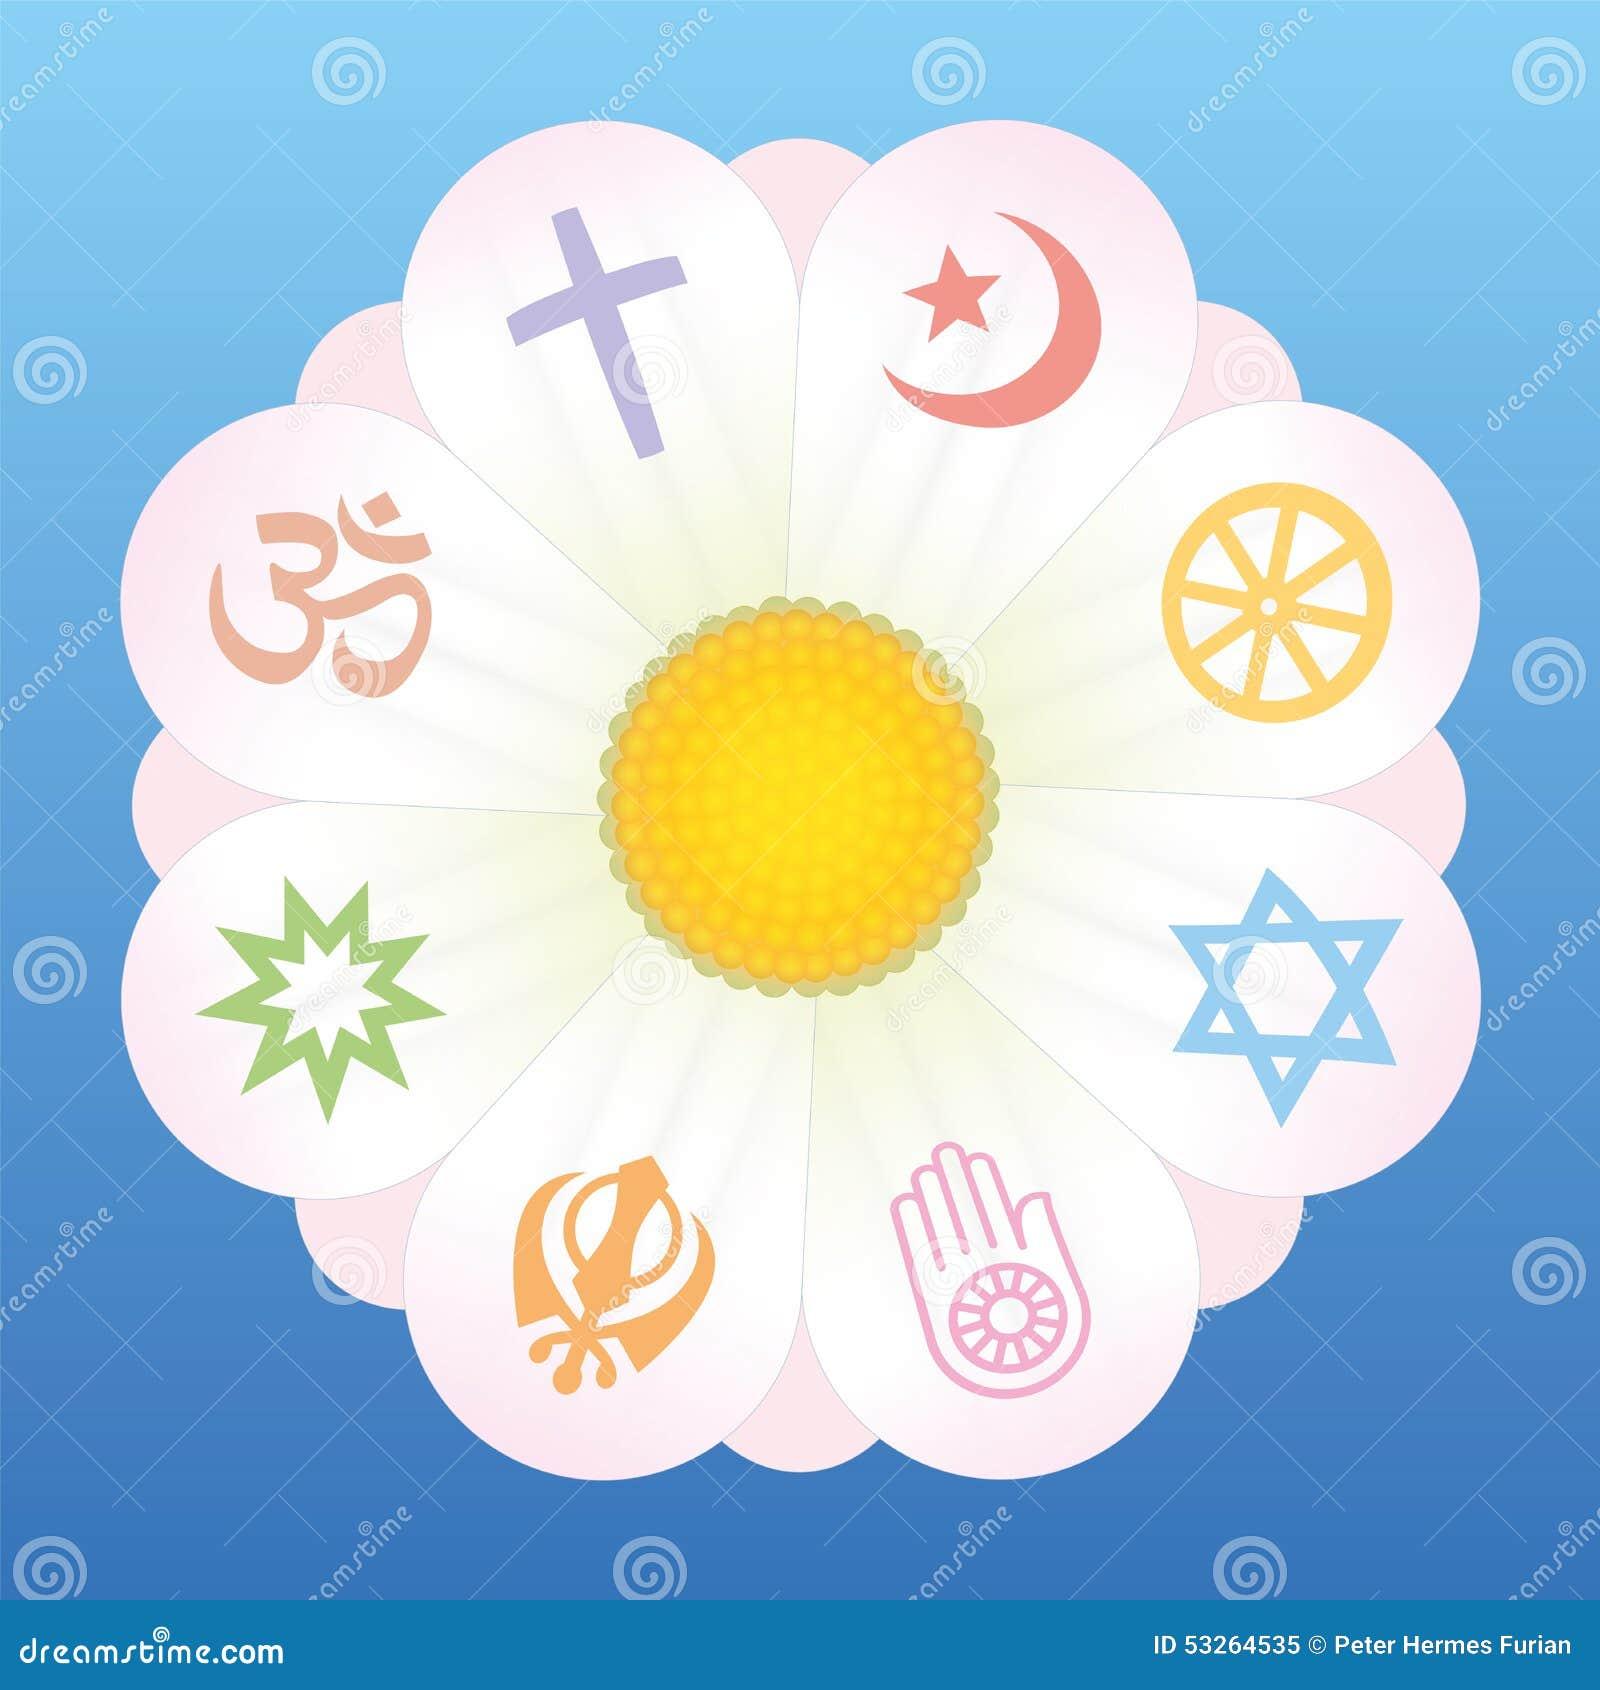 World Religions Flower Symbols Stock Vector Illustration Of Jewish